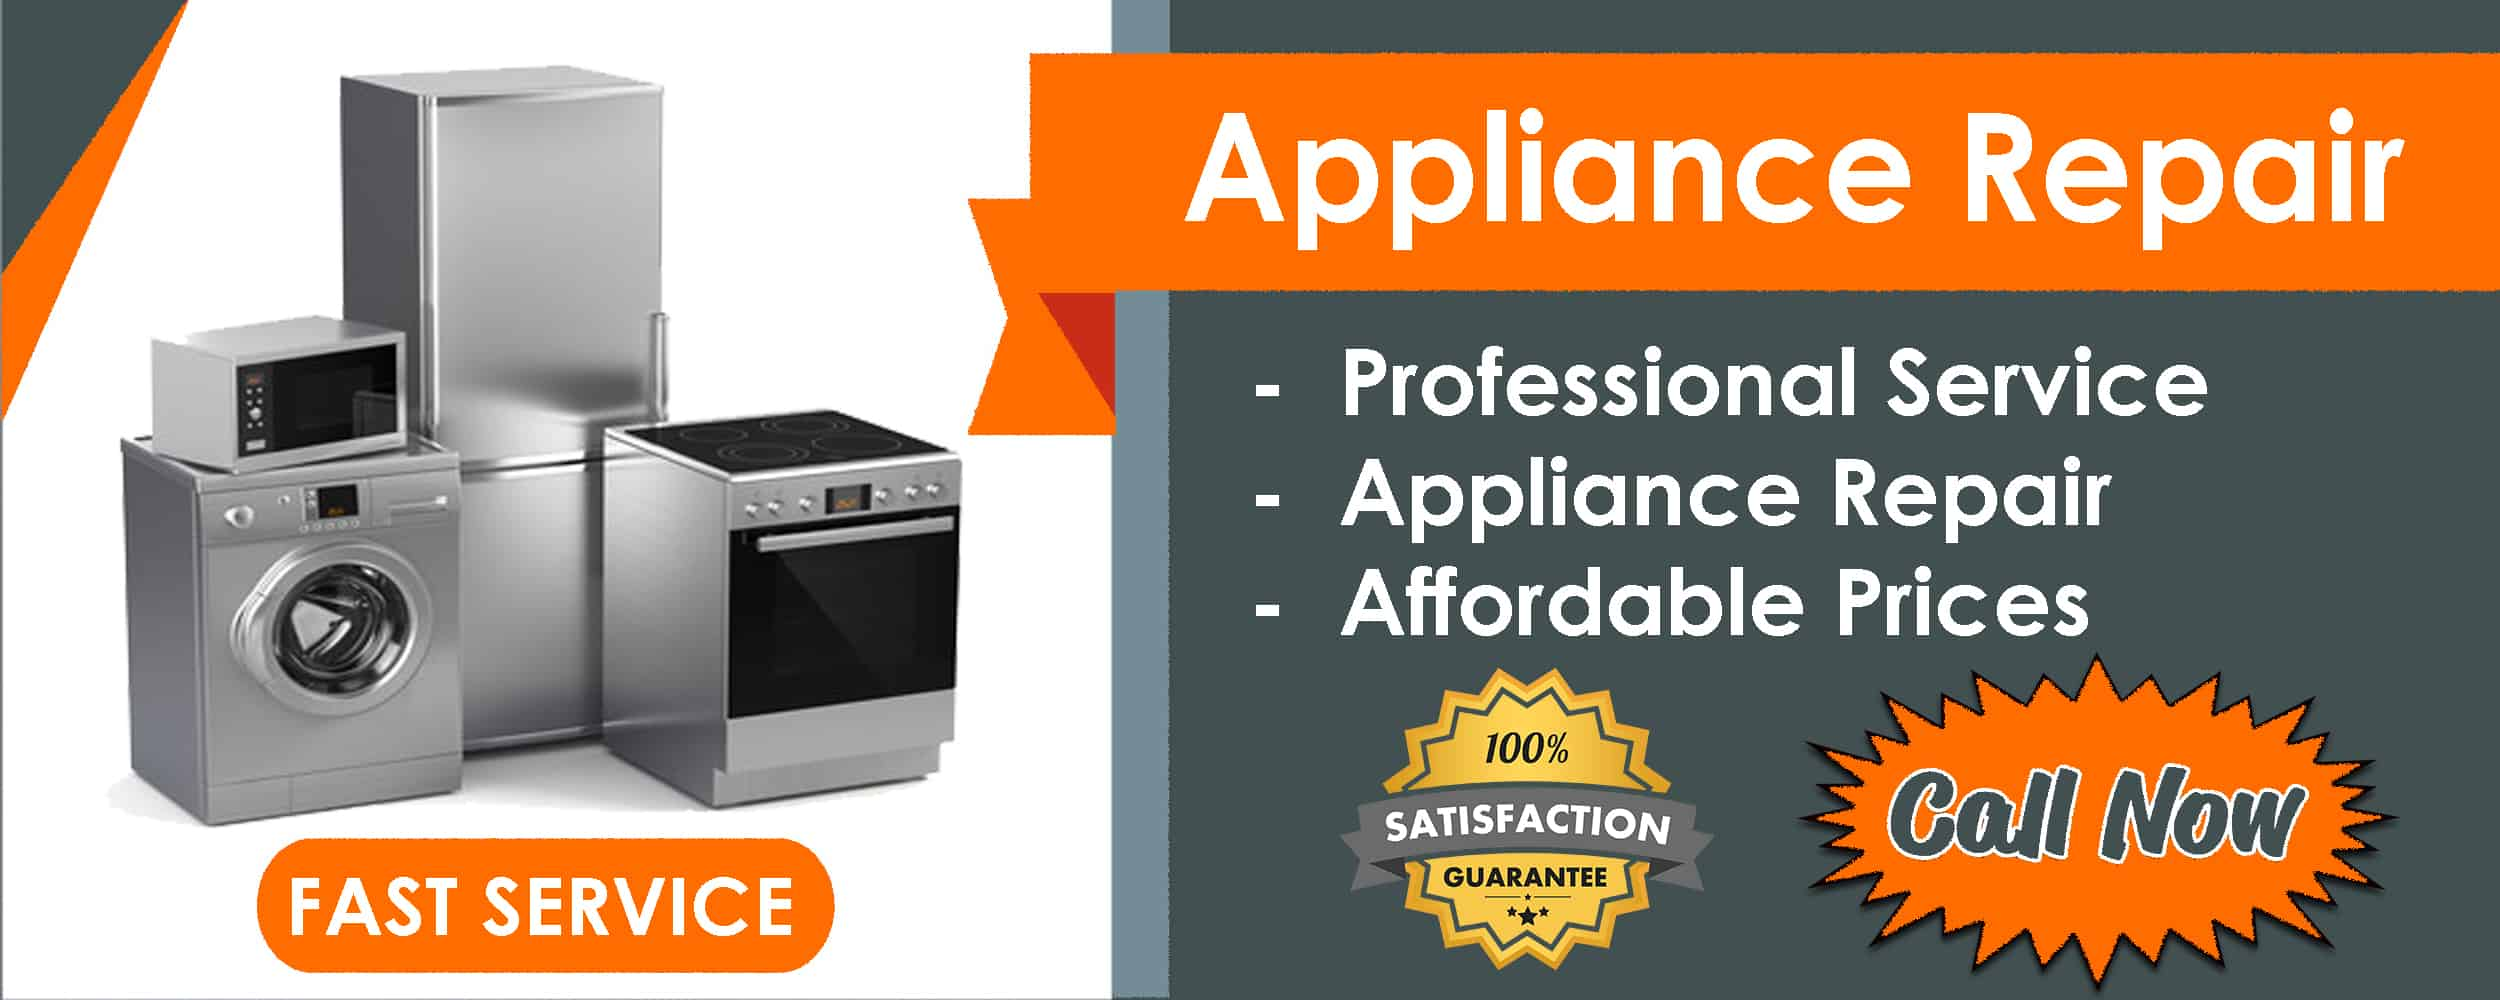 appliance repair service list